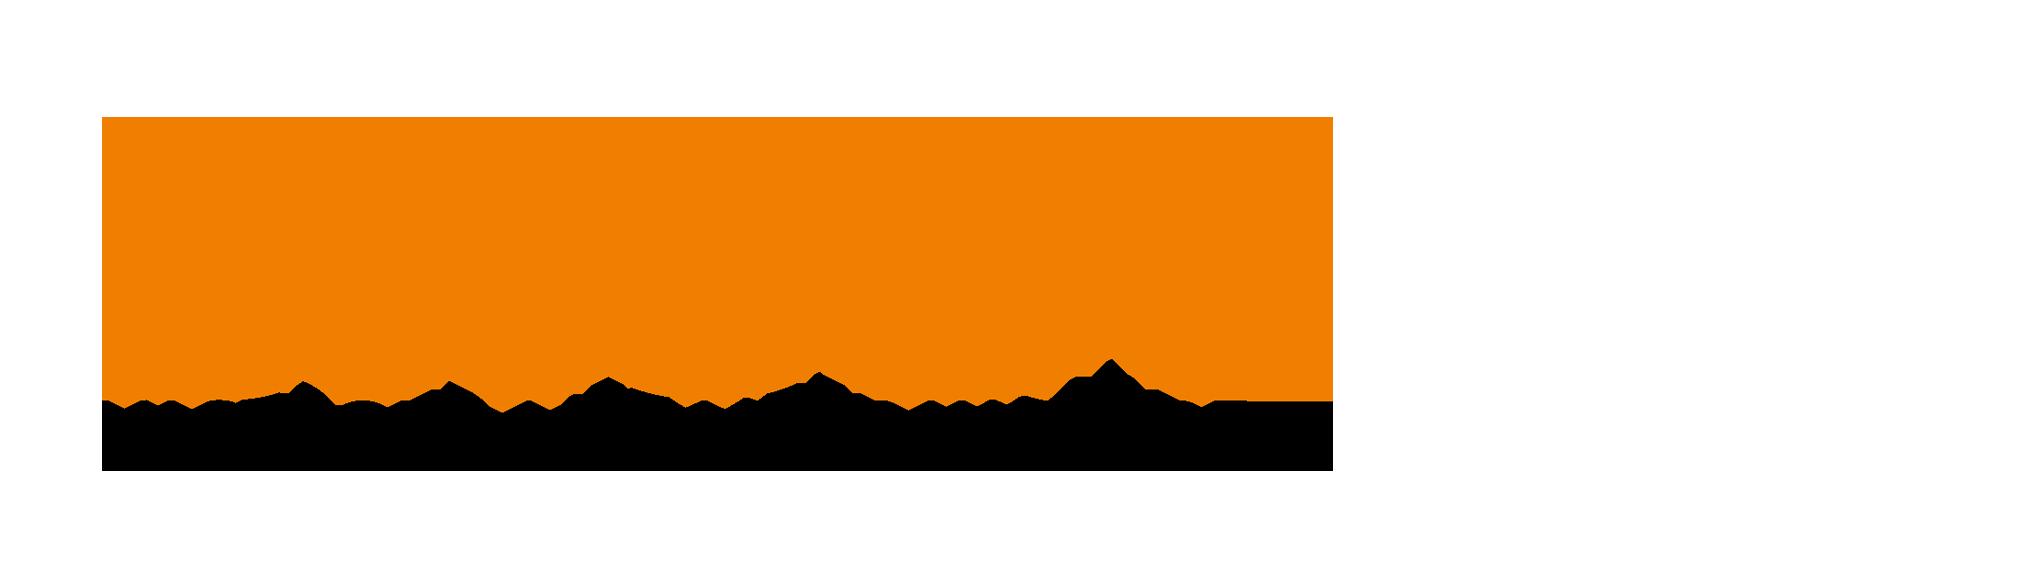 vernieuwd Brody logo ontwikkeling